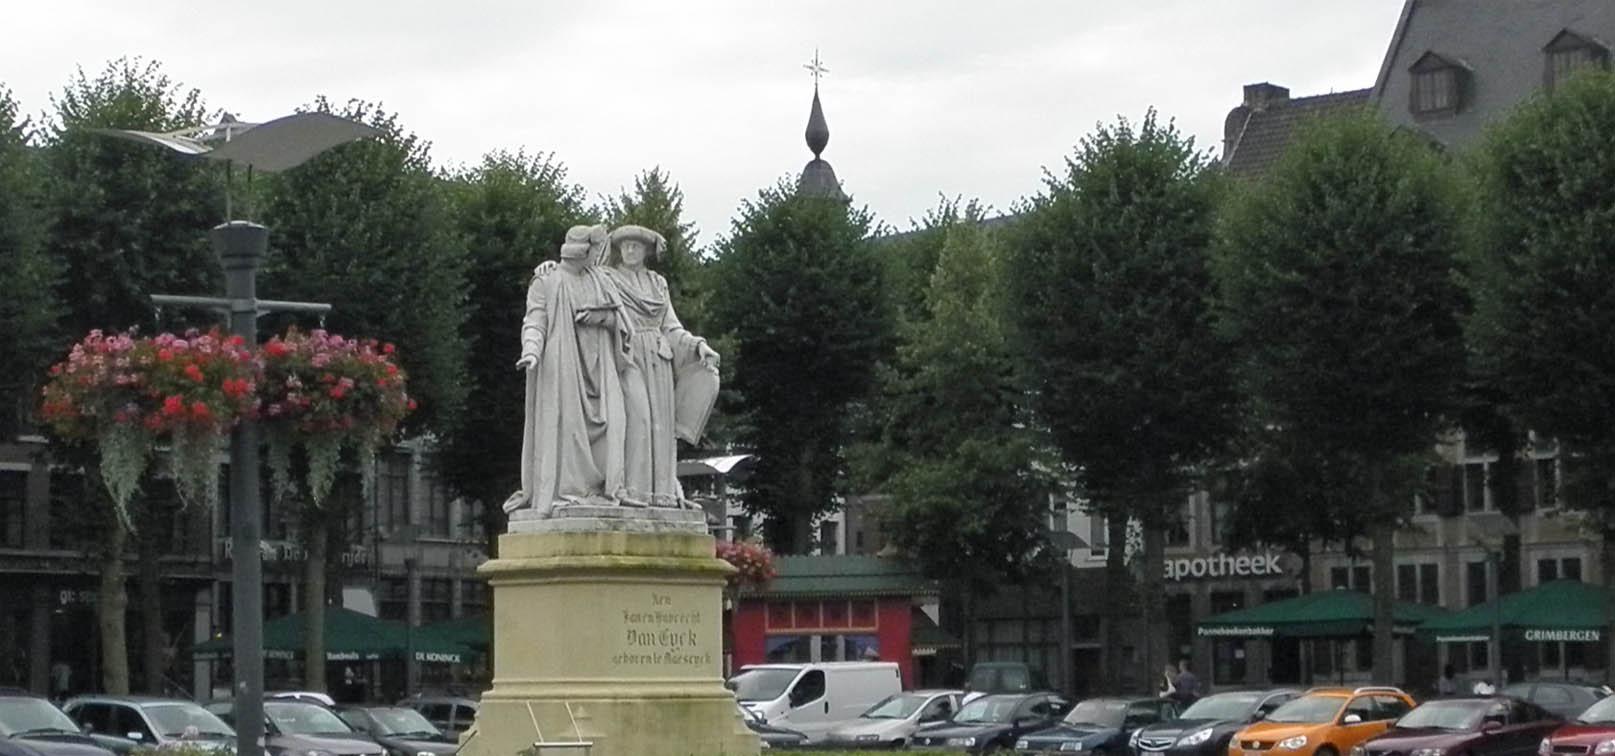 Maaseik (Belgium)